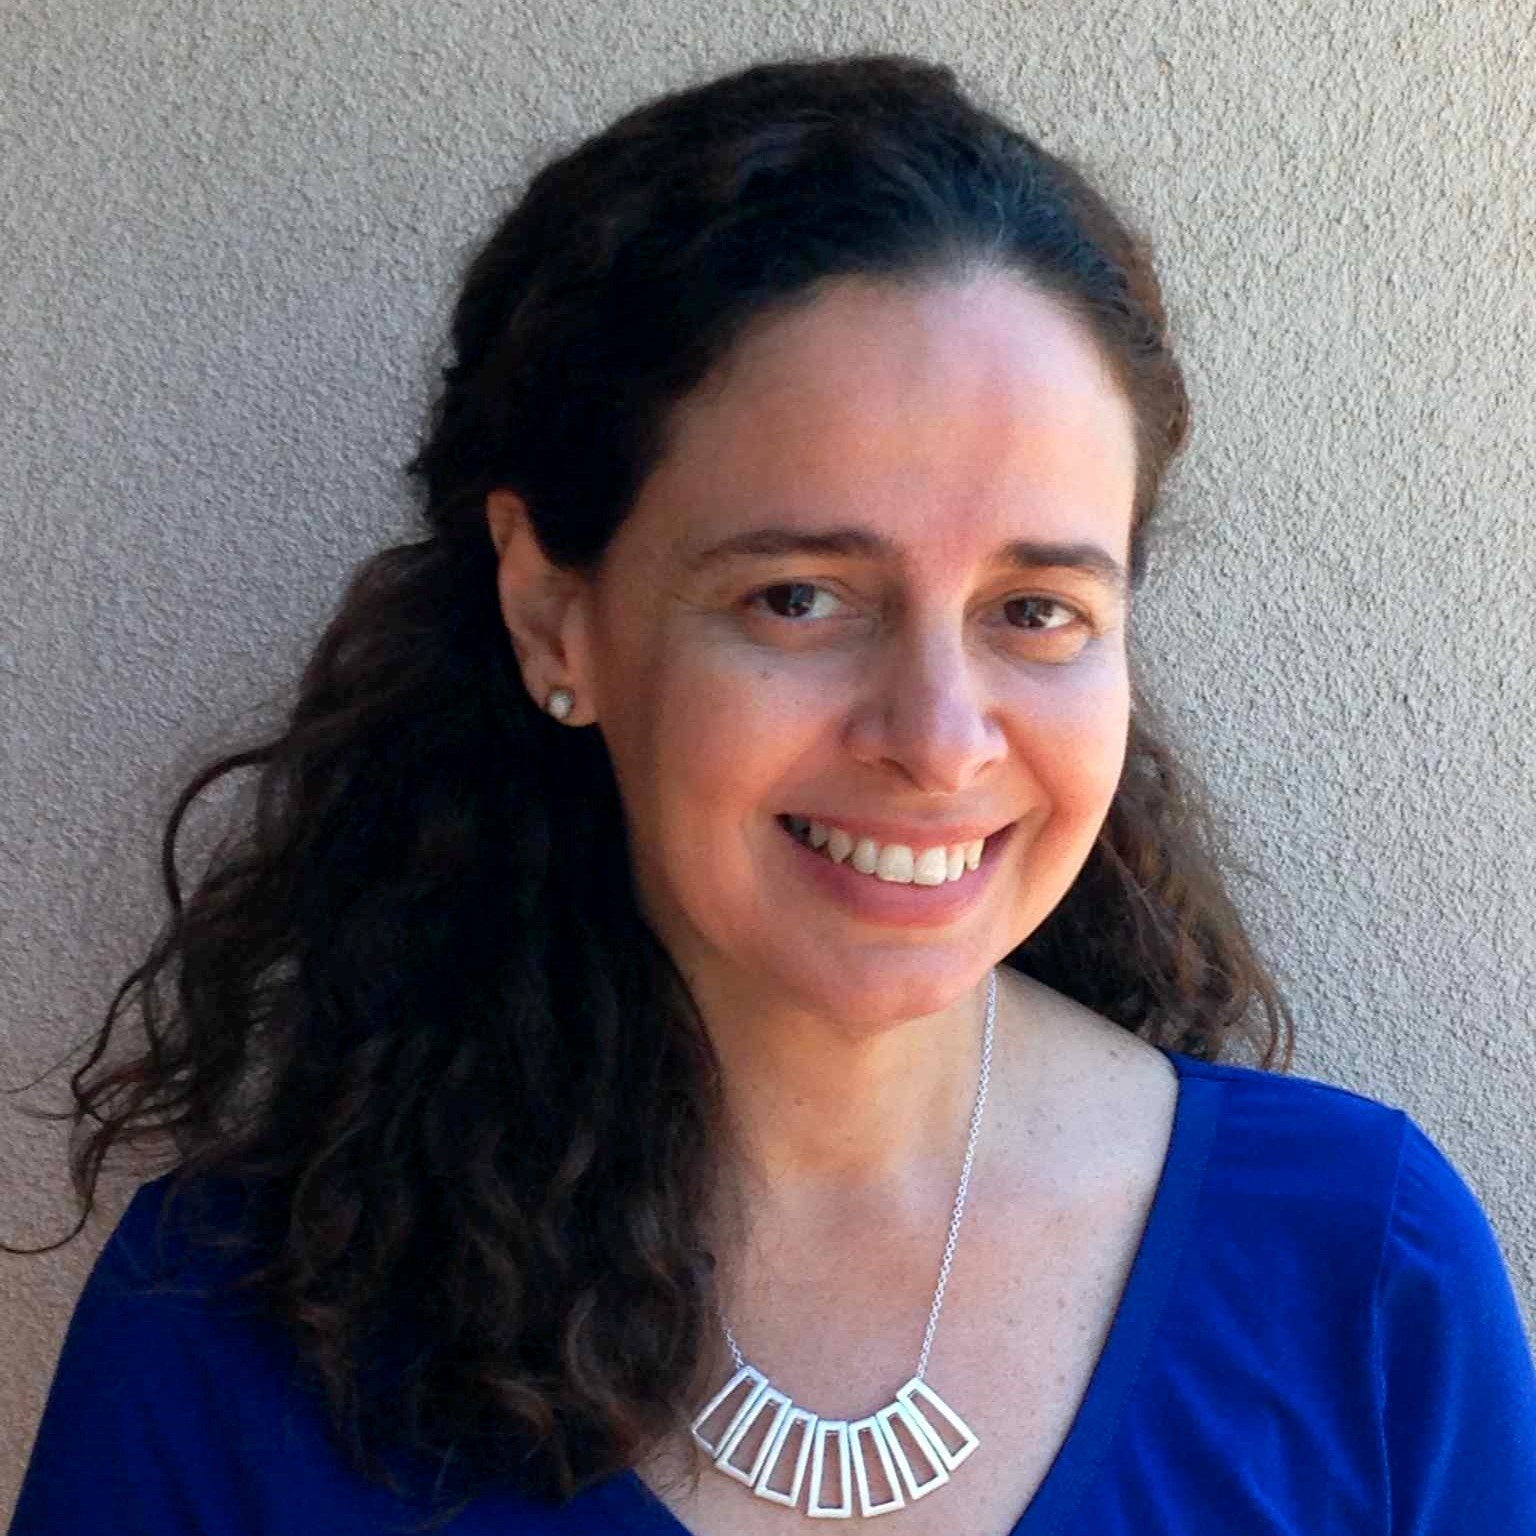 Silvia Figueira (Santa Clara University)